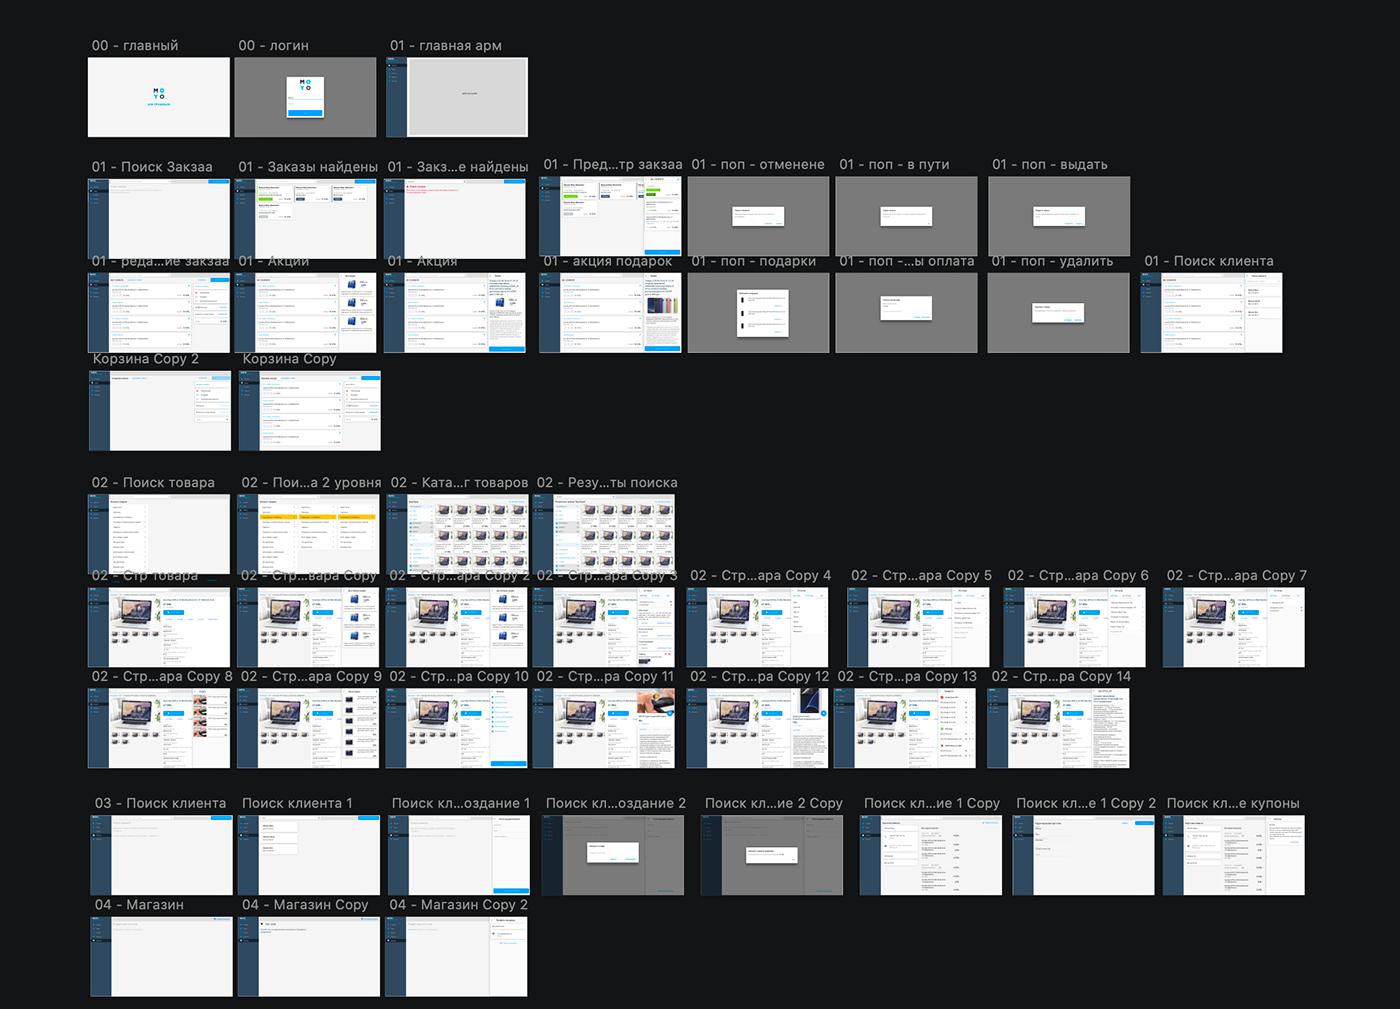 Image may contain: screenshot and electronics